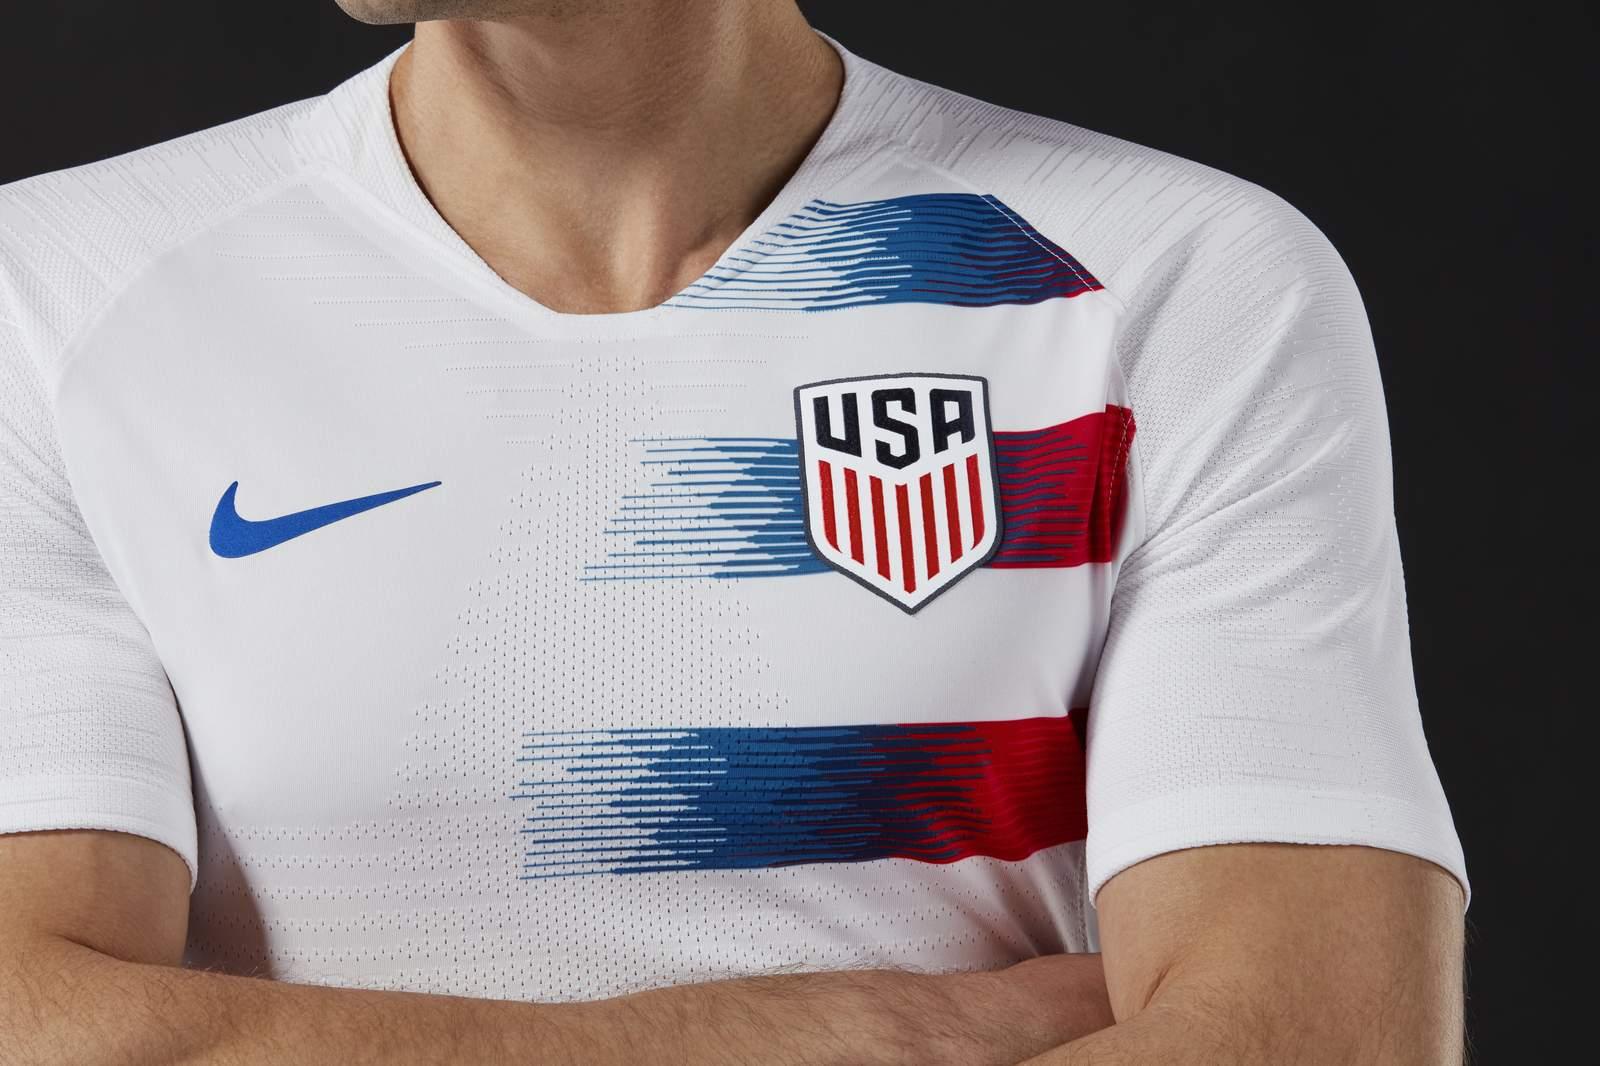 dc89f3cd1 Nike USA 2018 Home Kit Revealed - Footy Headlines